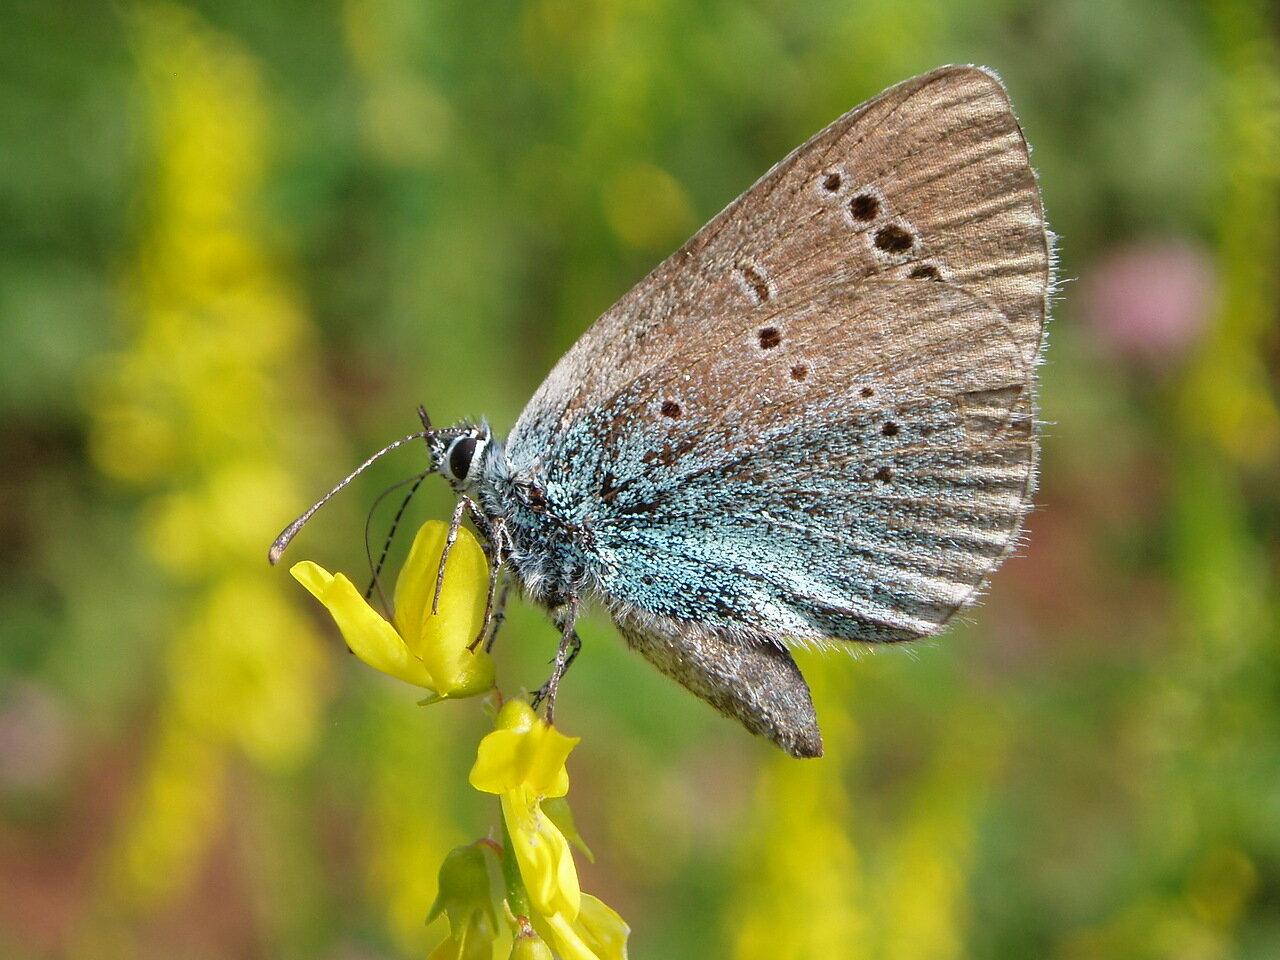 Голубянка алексис (Glaucopsyche alexis). Автор фото: Владимир Брюхов